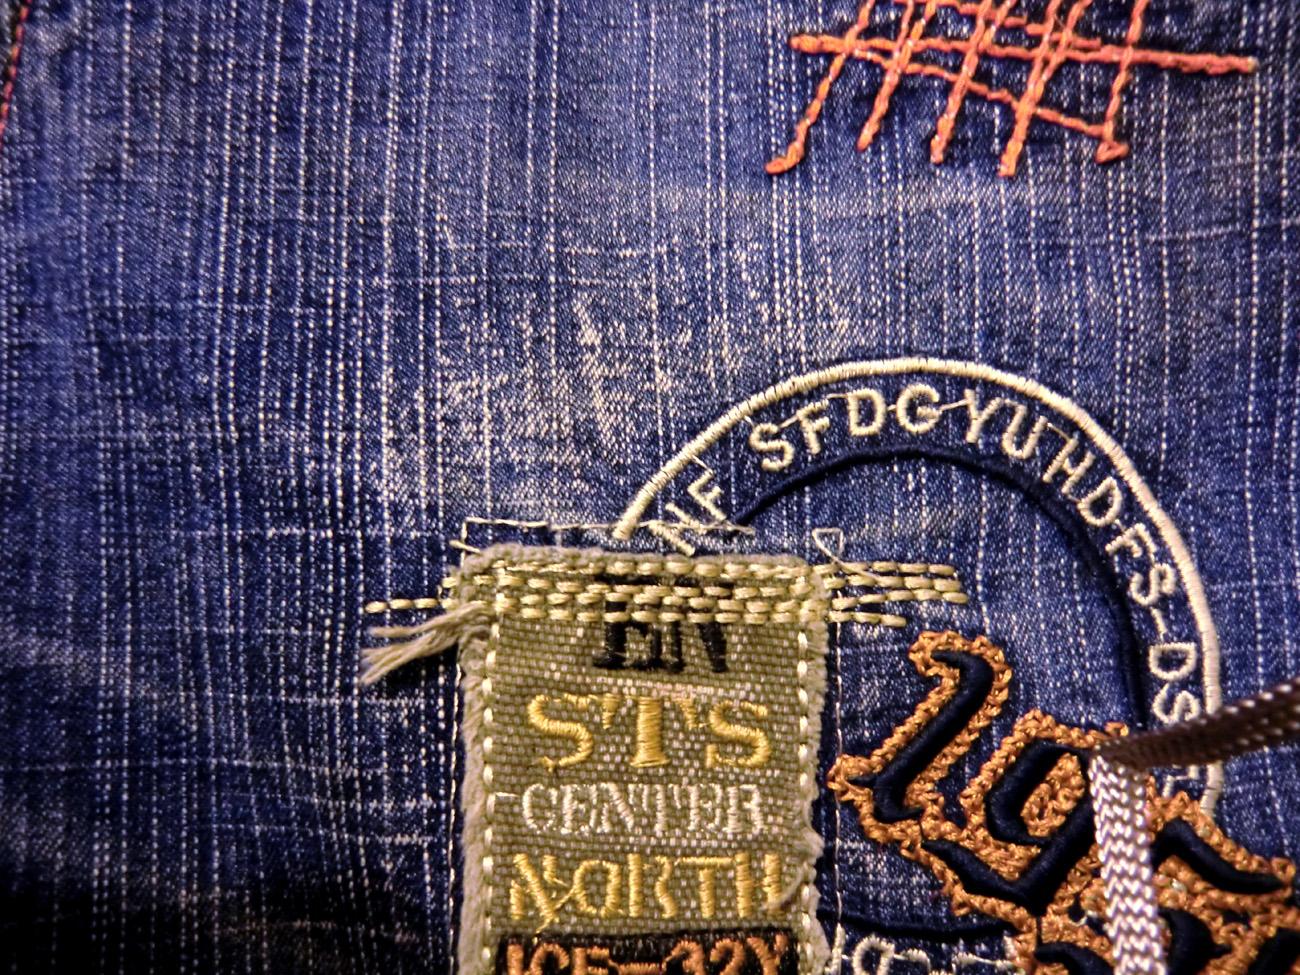 http://3.bp.blogspot.com/-DWFFr9RfIRo/TuiBX_Nw2JI/AAAAAAAAY80/beAaiRkKcIM/s1600/Gruge+Jeans+Wallpapers+%25284%2529.jpg